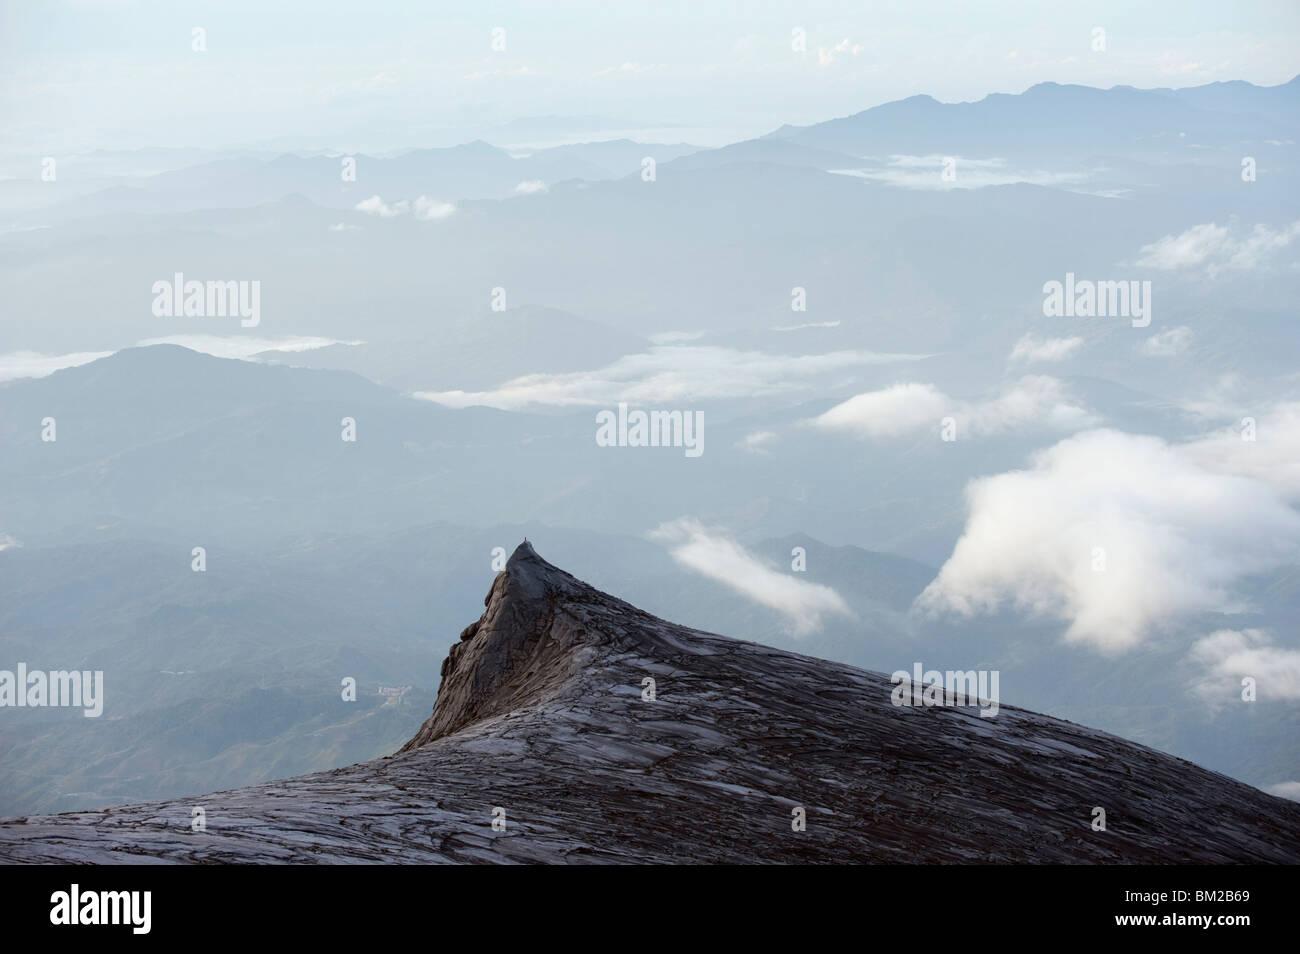 Kinabalu National Park, Malaysias highest mountain 4095m, Sabah, Borneo, Malaysia, Southeast Asia - Stock Image